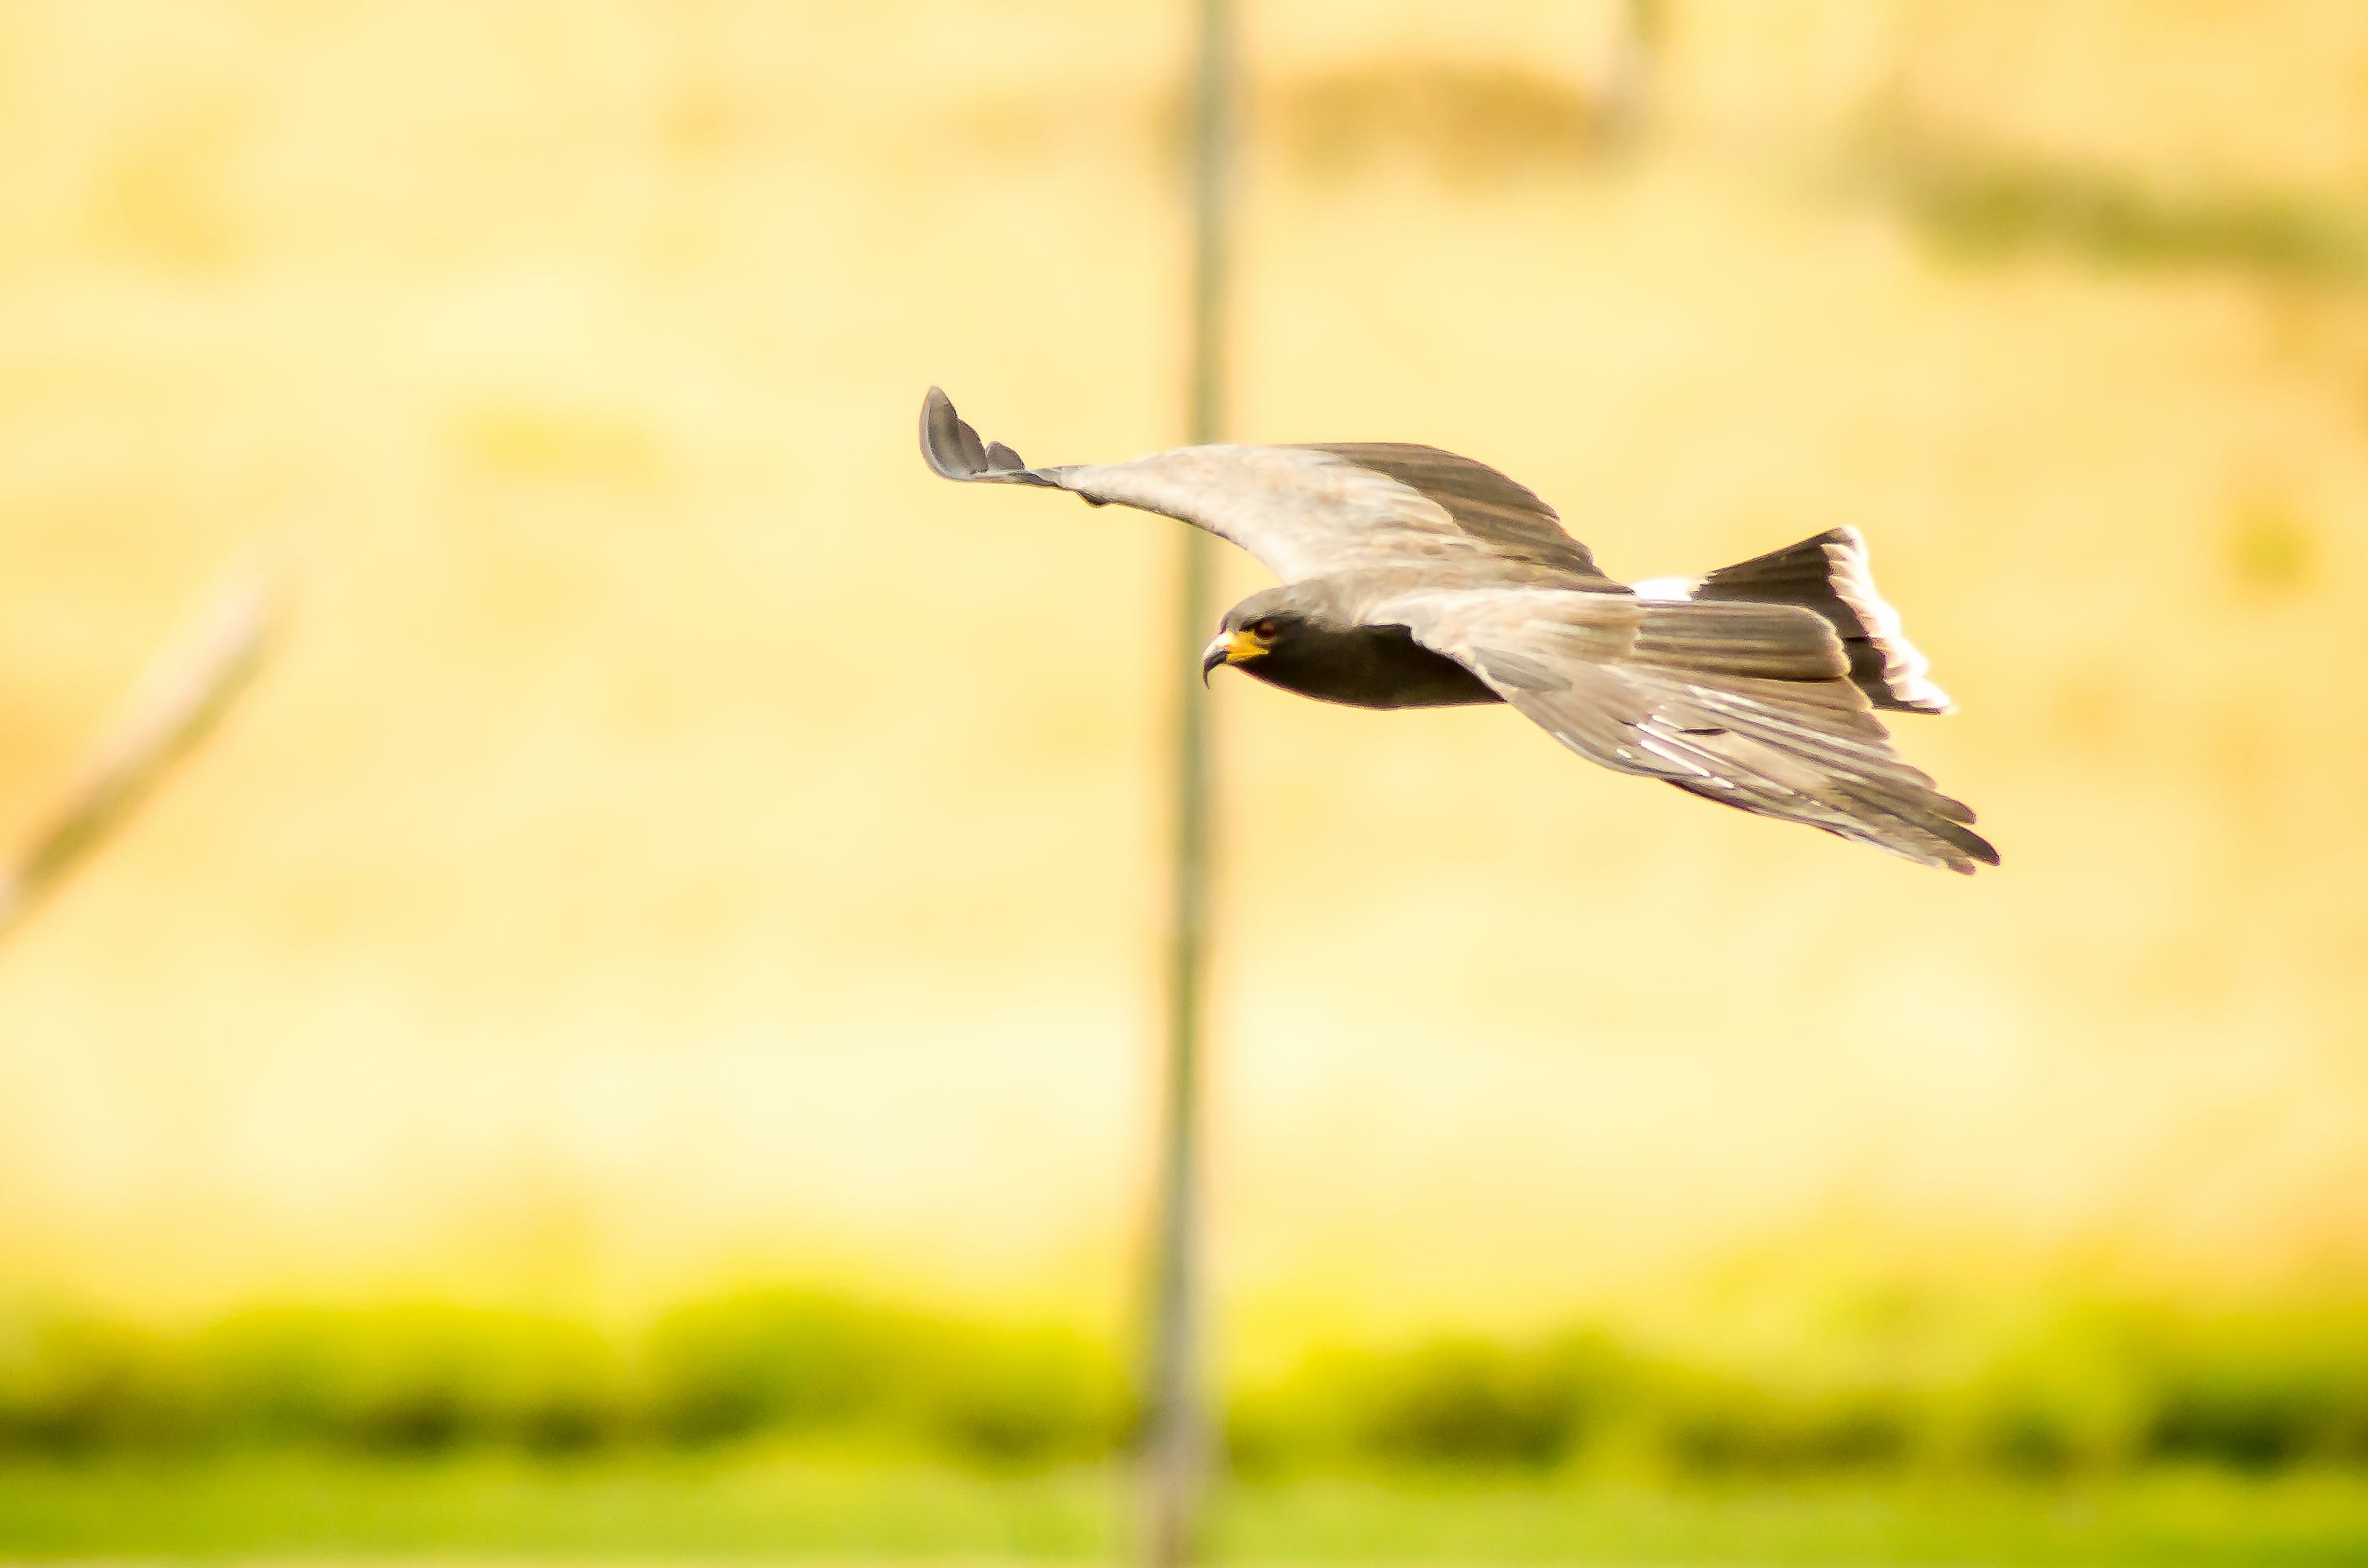 Kostenloses Stock Foto zu draußen, falke, federn, fliege